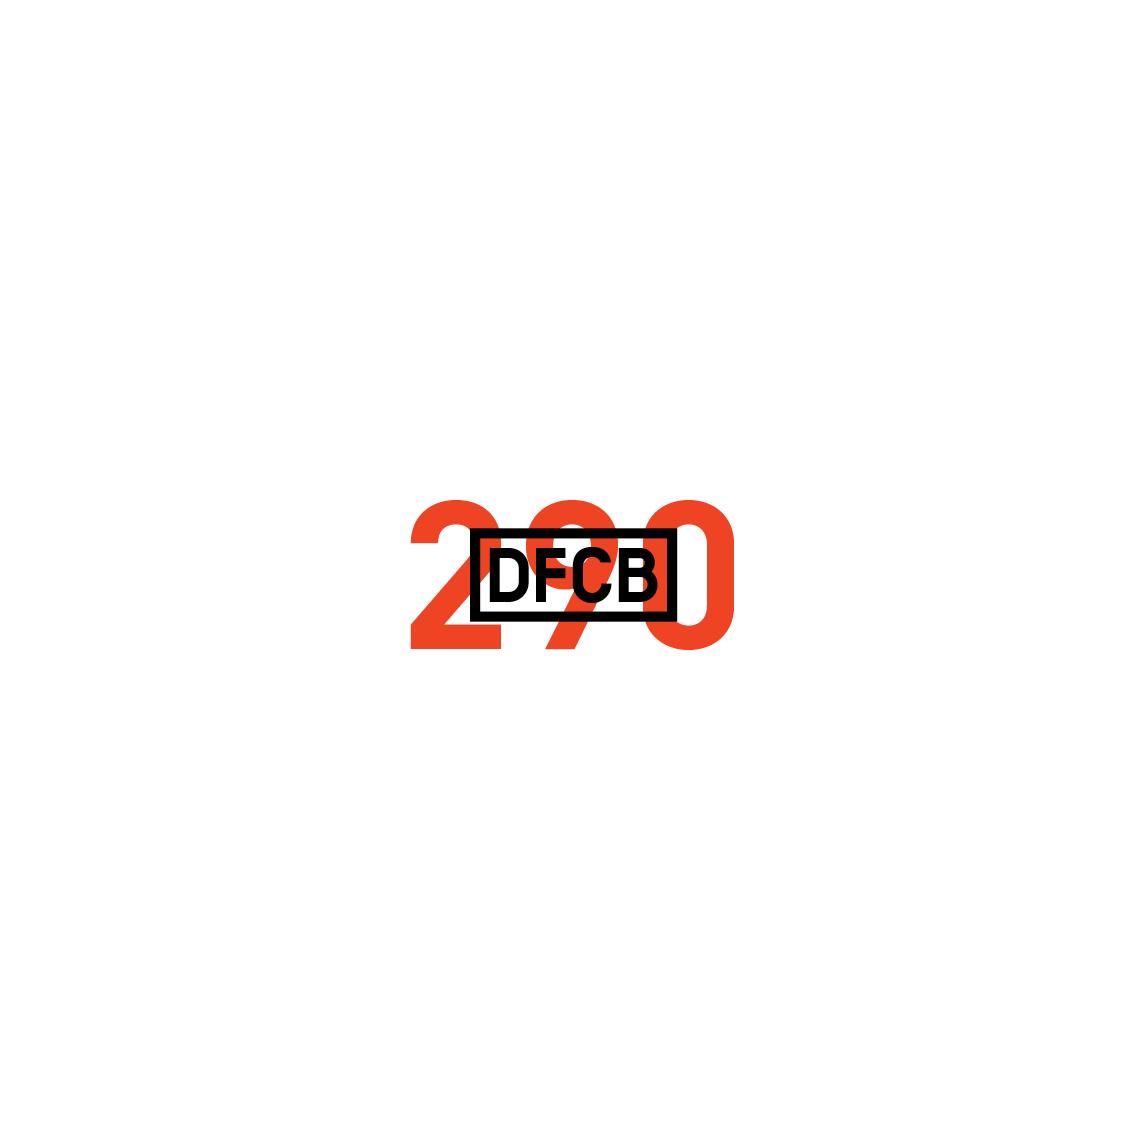 290-small75.jpg